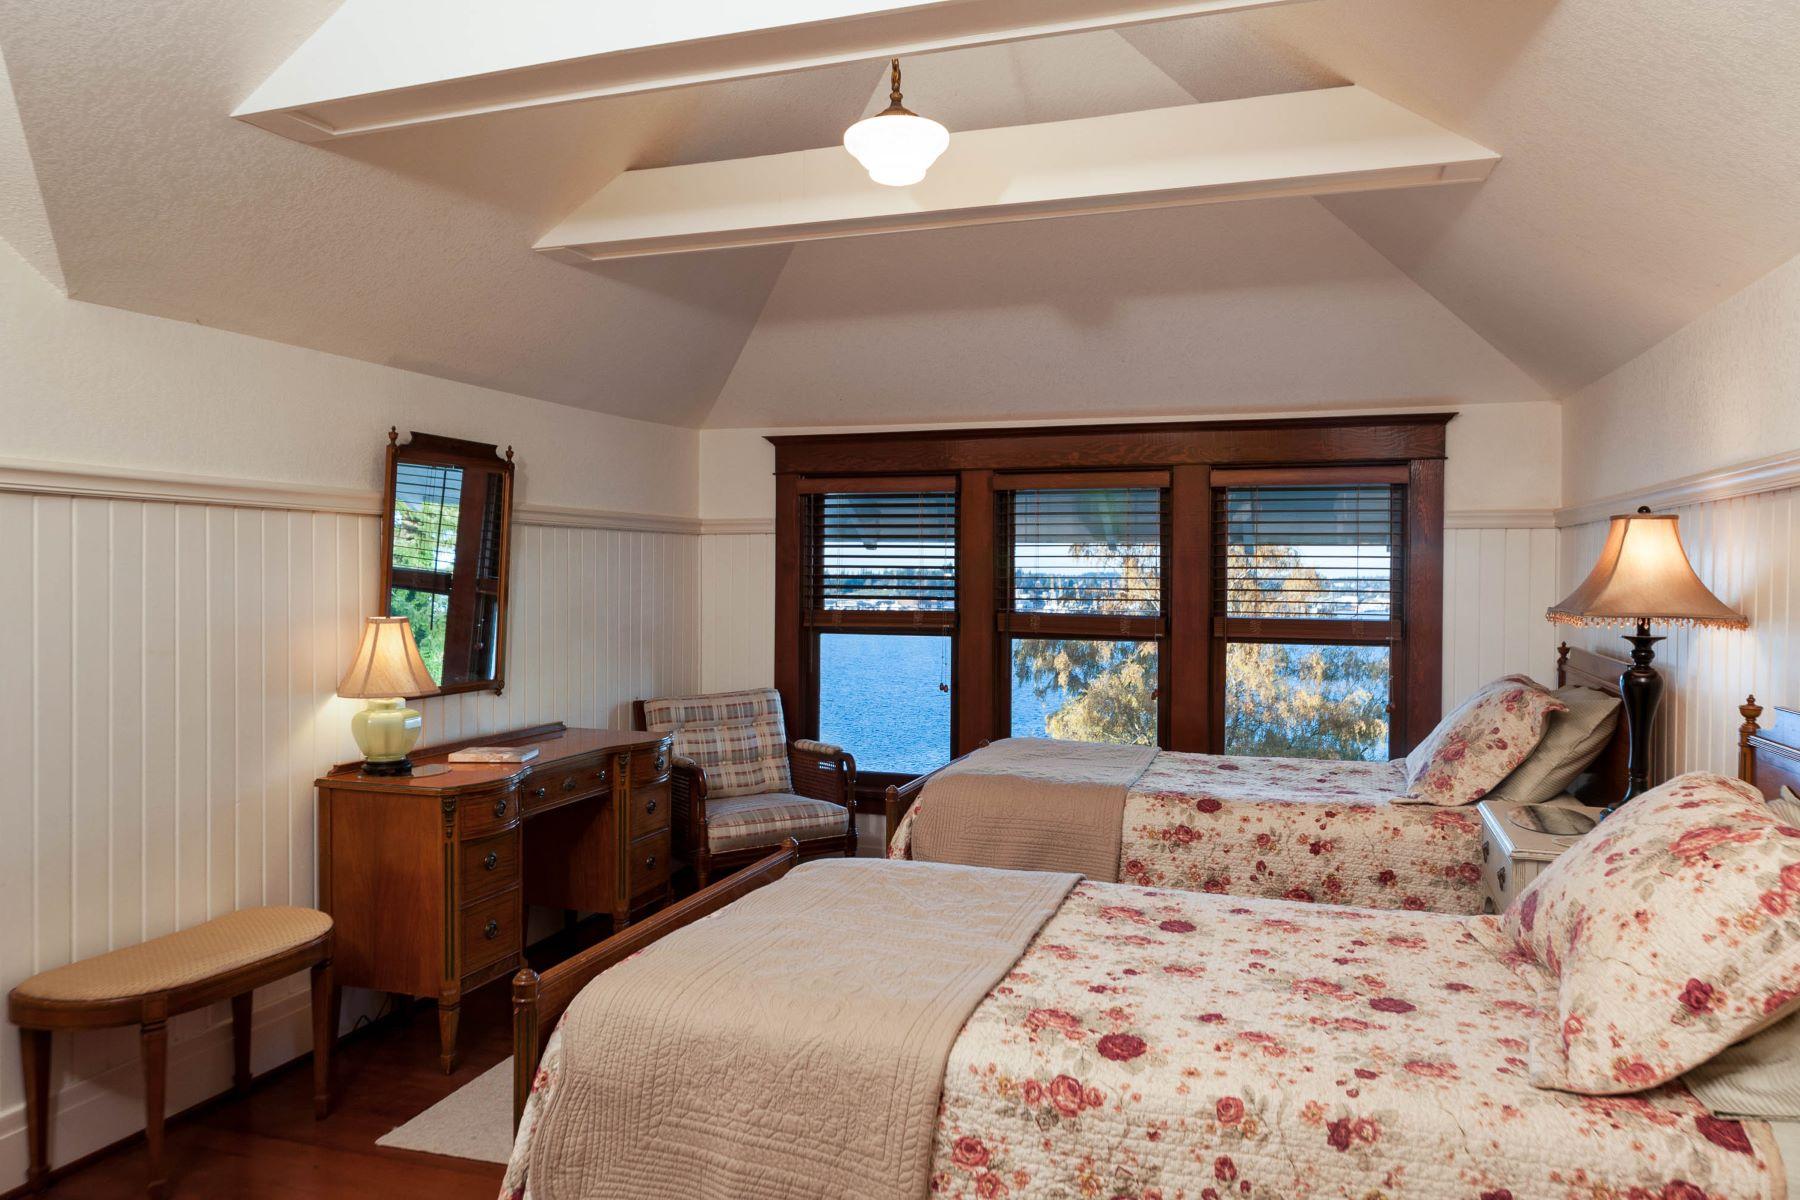 Additional photo for property listing at Elegantly Restored Port Orchard Estate 228 Seattle Ave Port Orchard, Washington 98366 United States